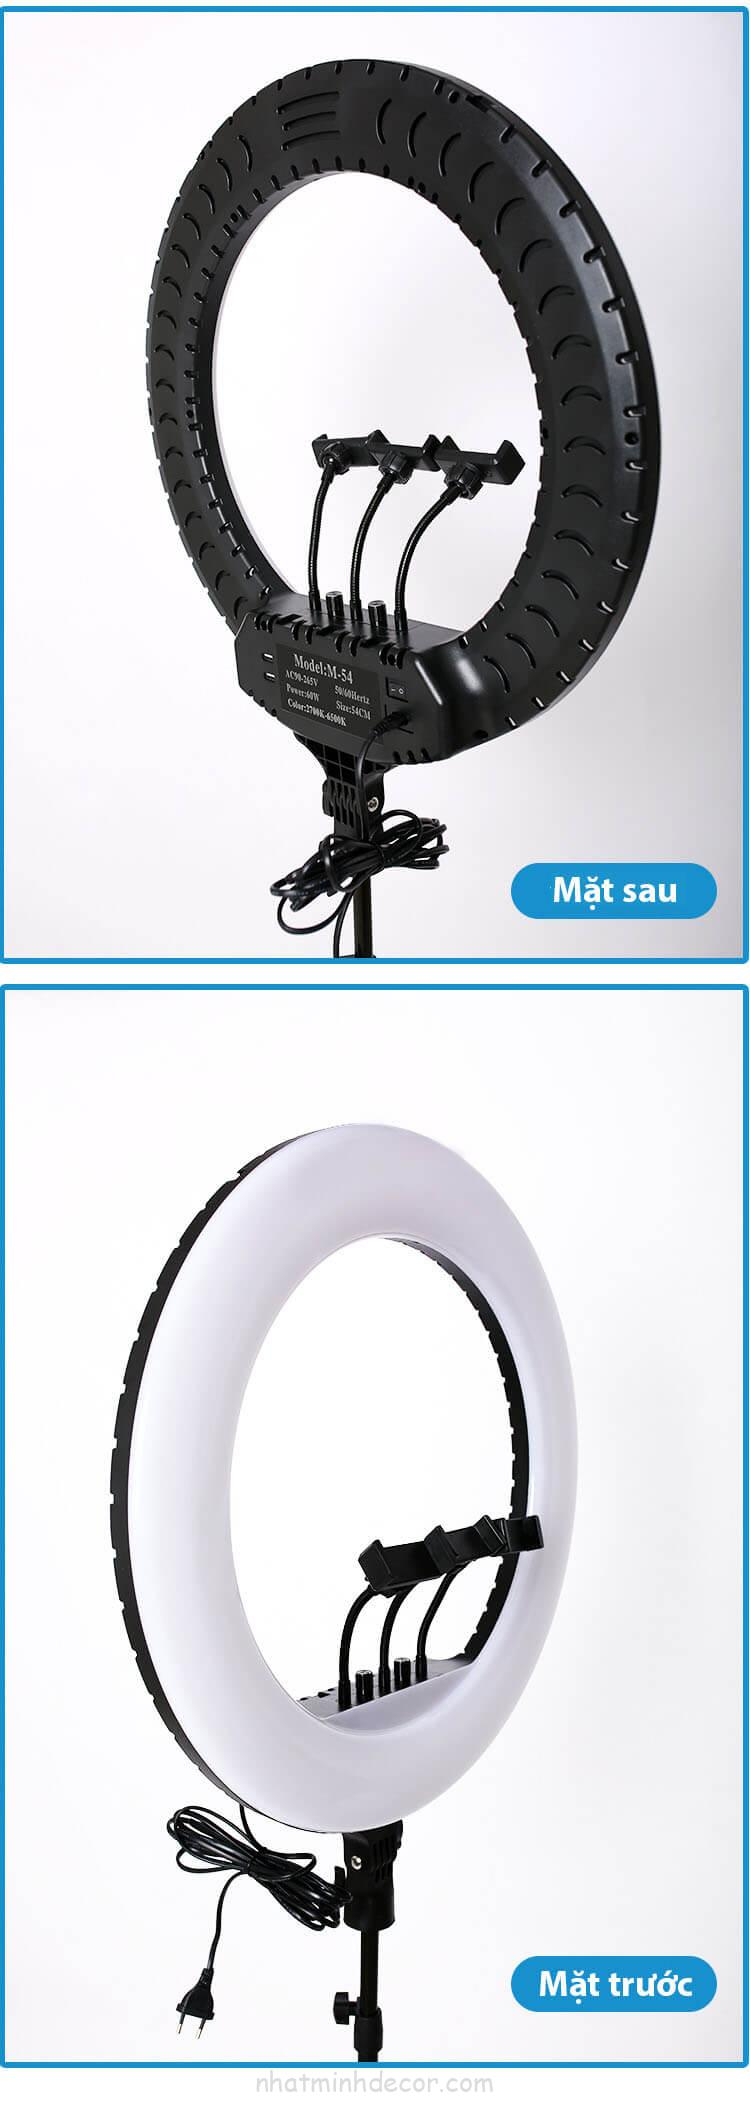 den-led-ring-size-54cm-ho-tro-livestream-kep-3-dien-thoai-makeup-chup-hinh-studio-ban-hang-online-9